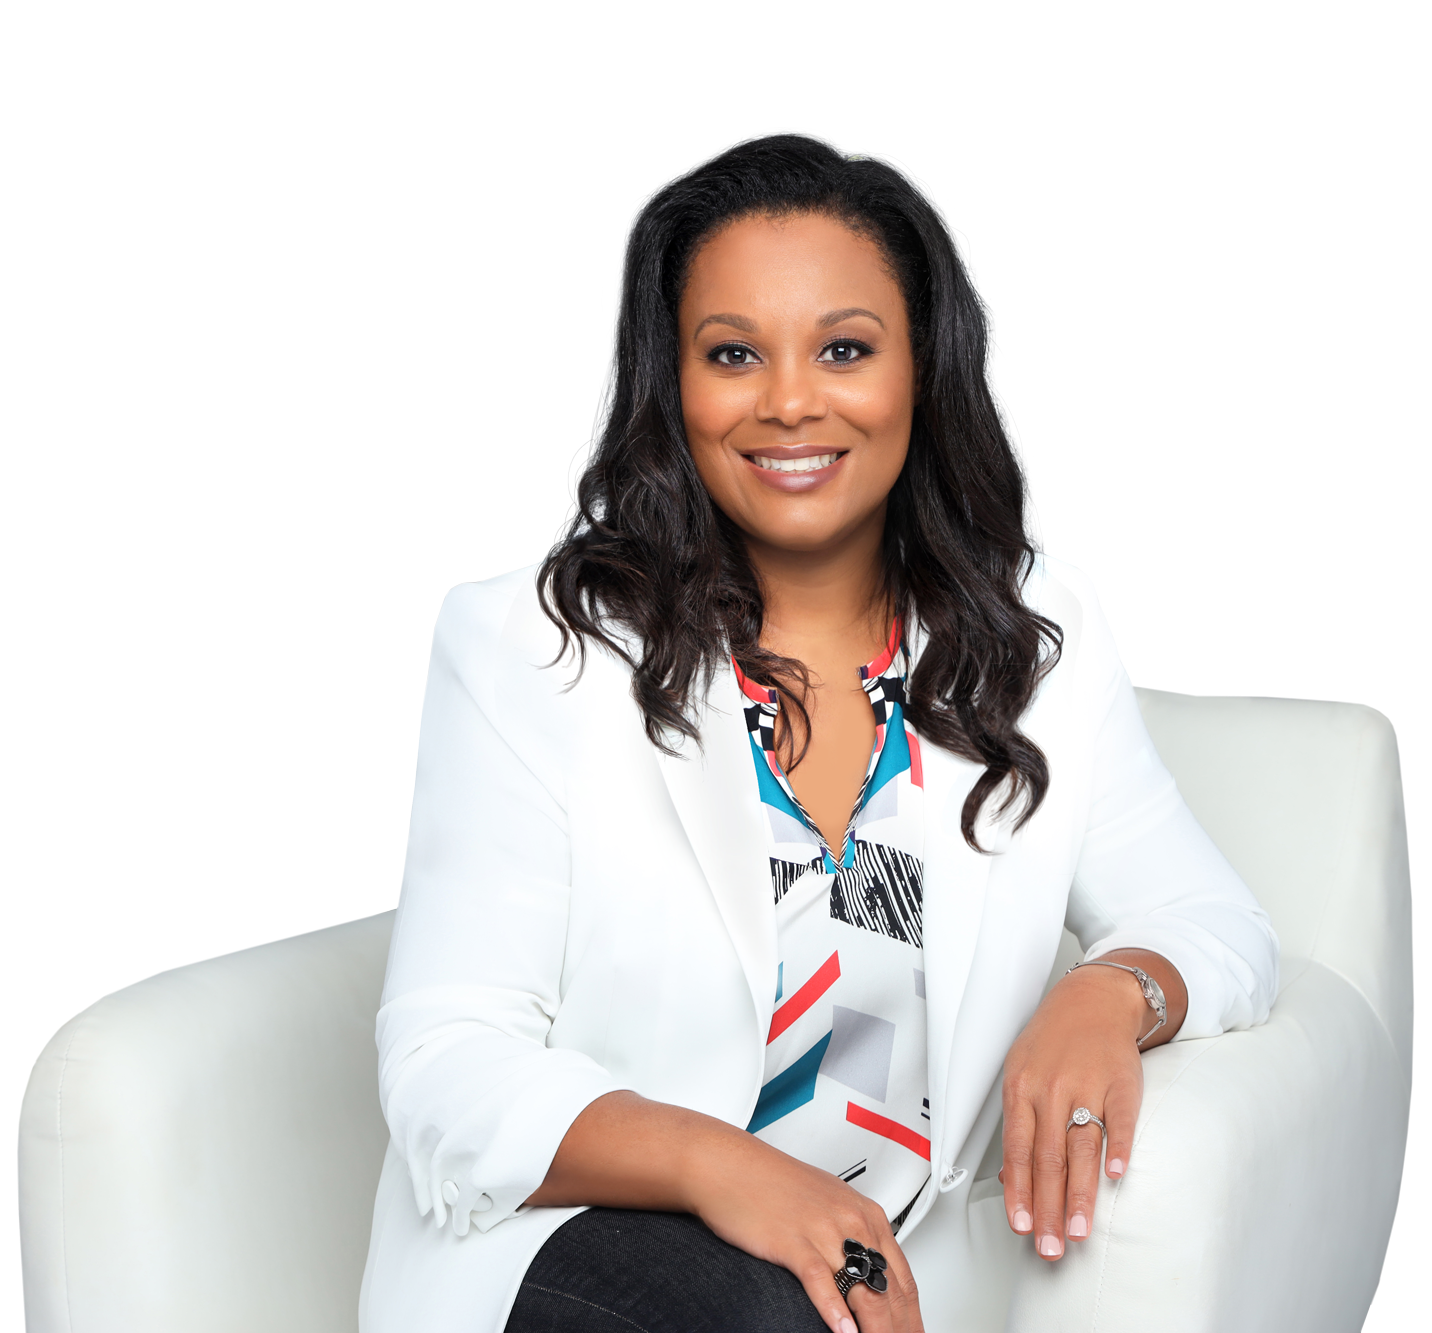 Leah JM Dean, author of Assemble The Tribe, Leadership Strategist